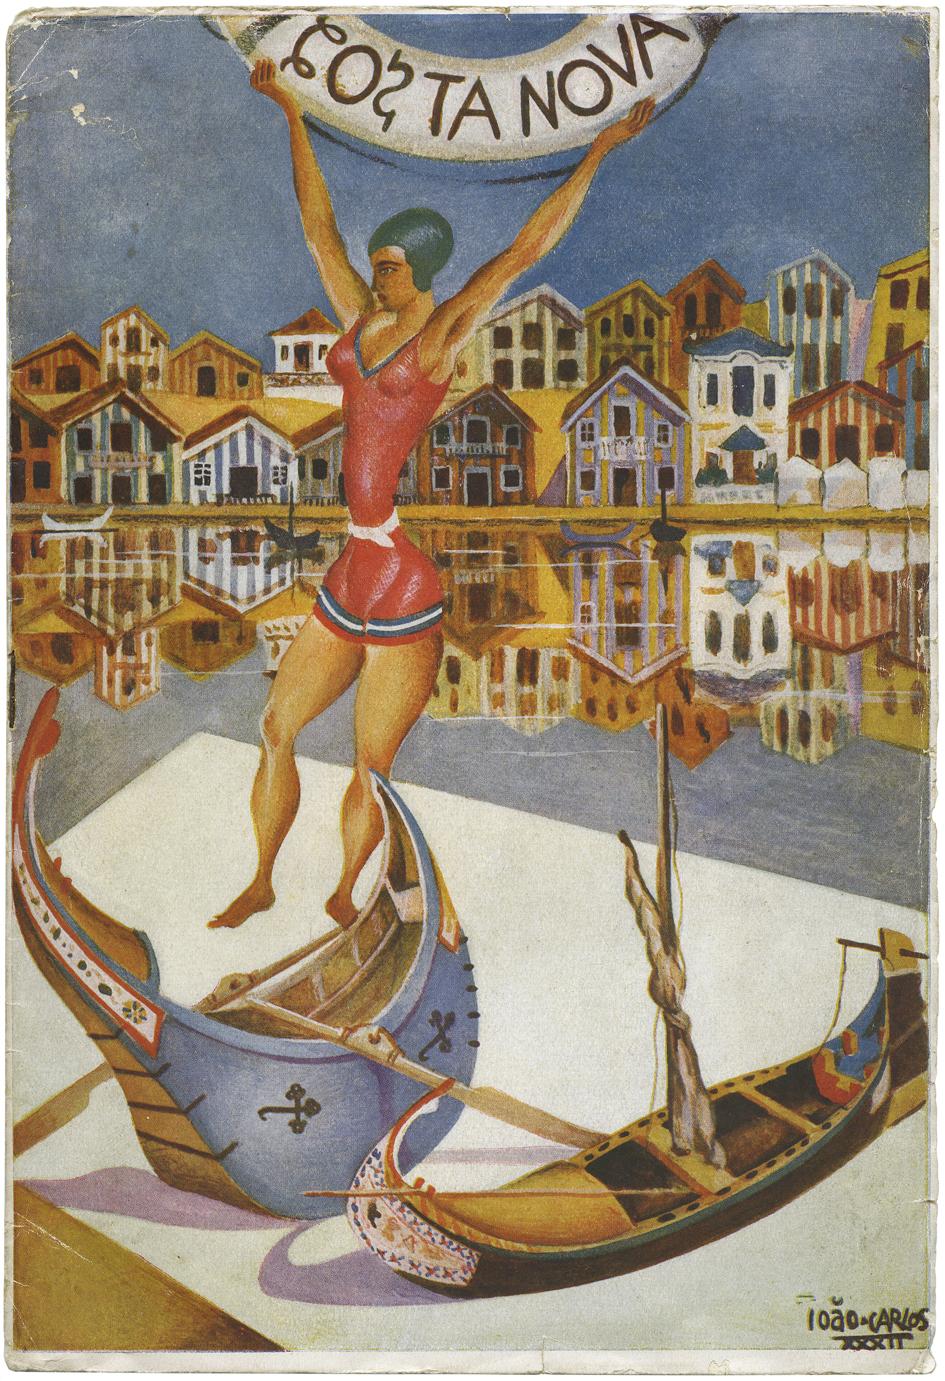 costa-nova-1932